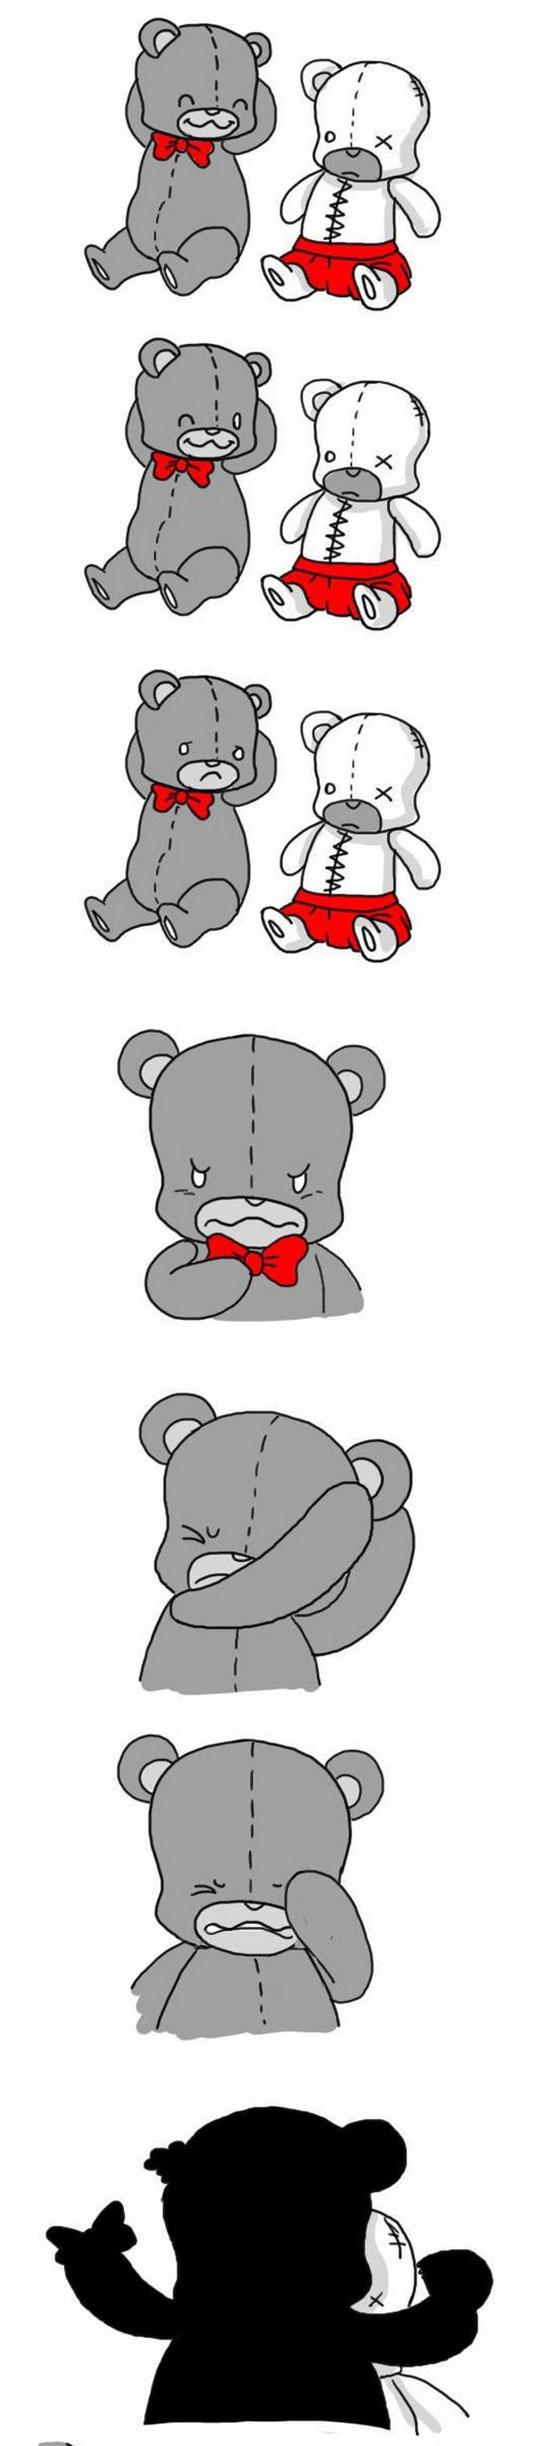 funny-webcomic-bear-fixing-ripping-ear